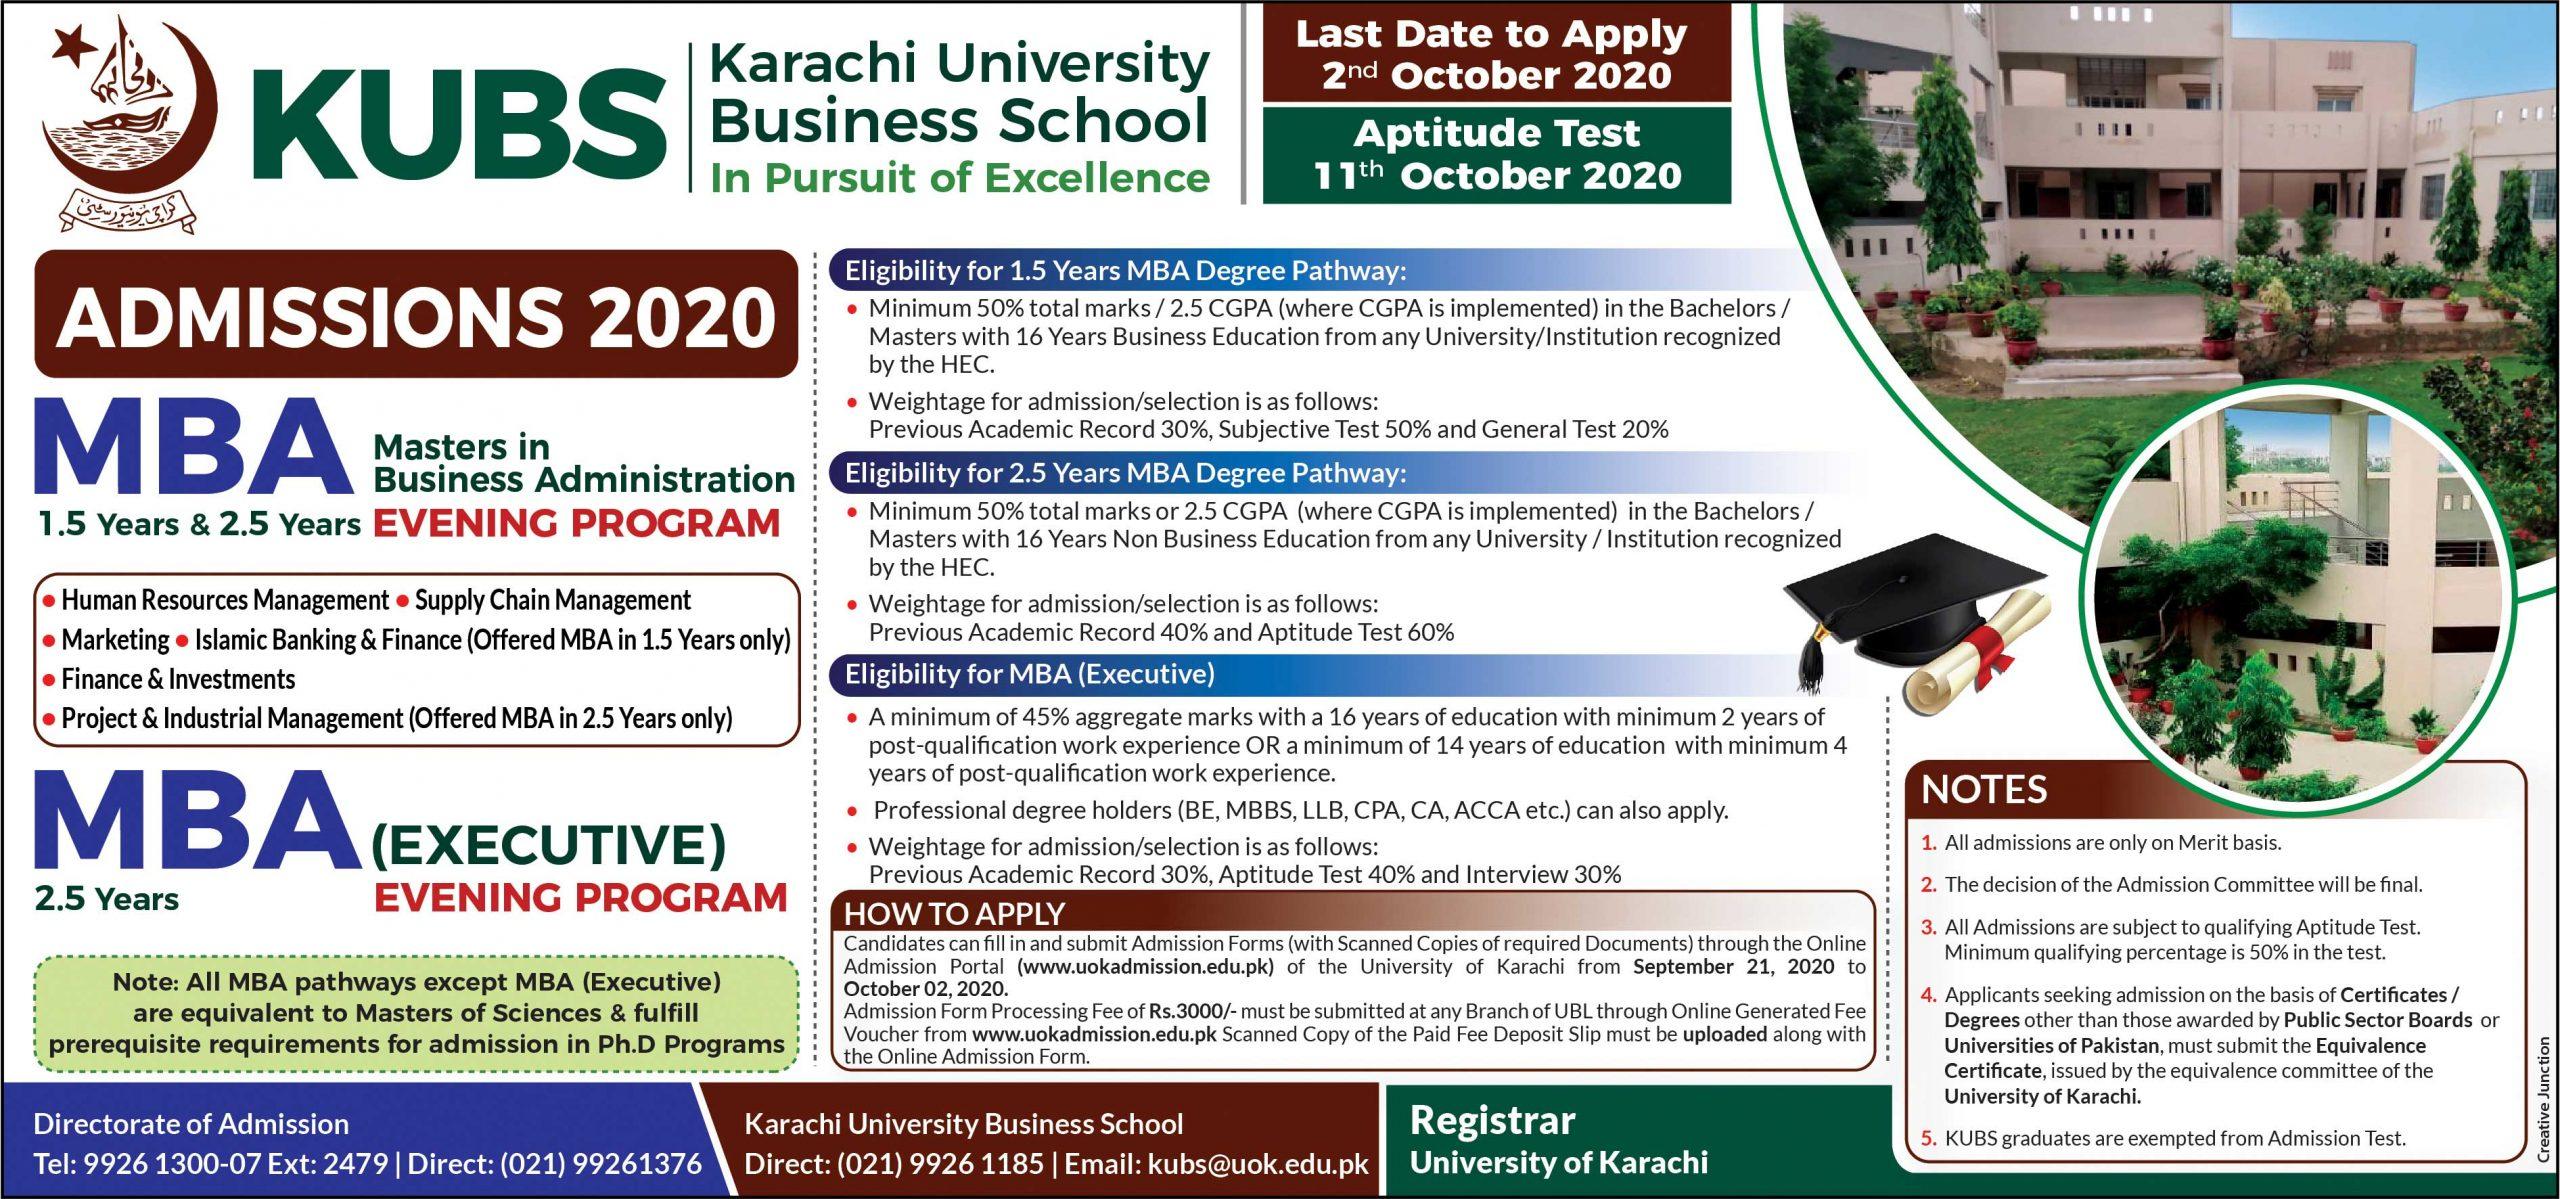 University of Karachi admission advertisement